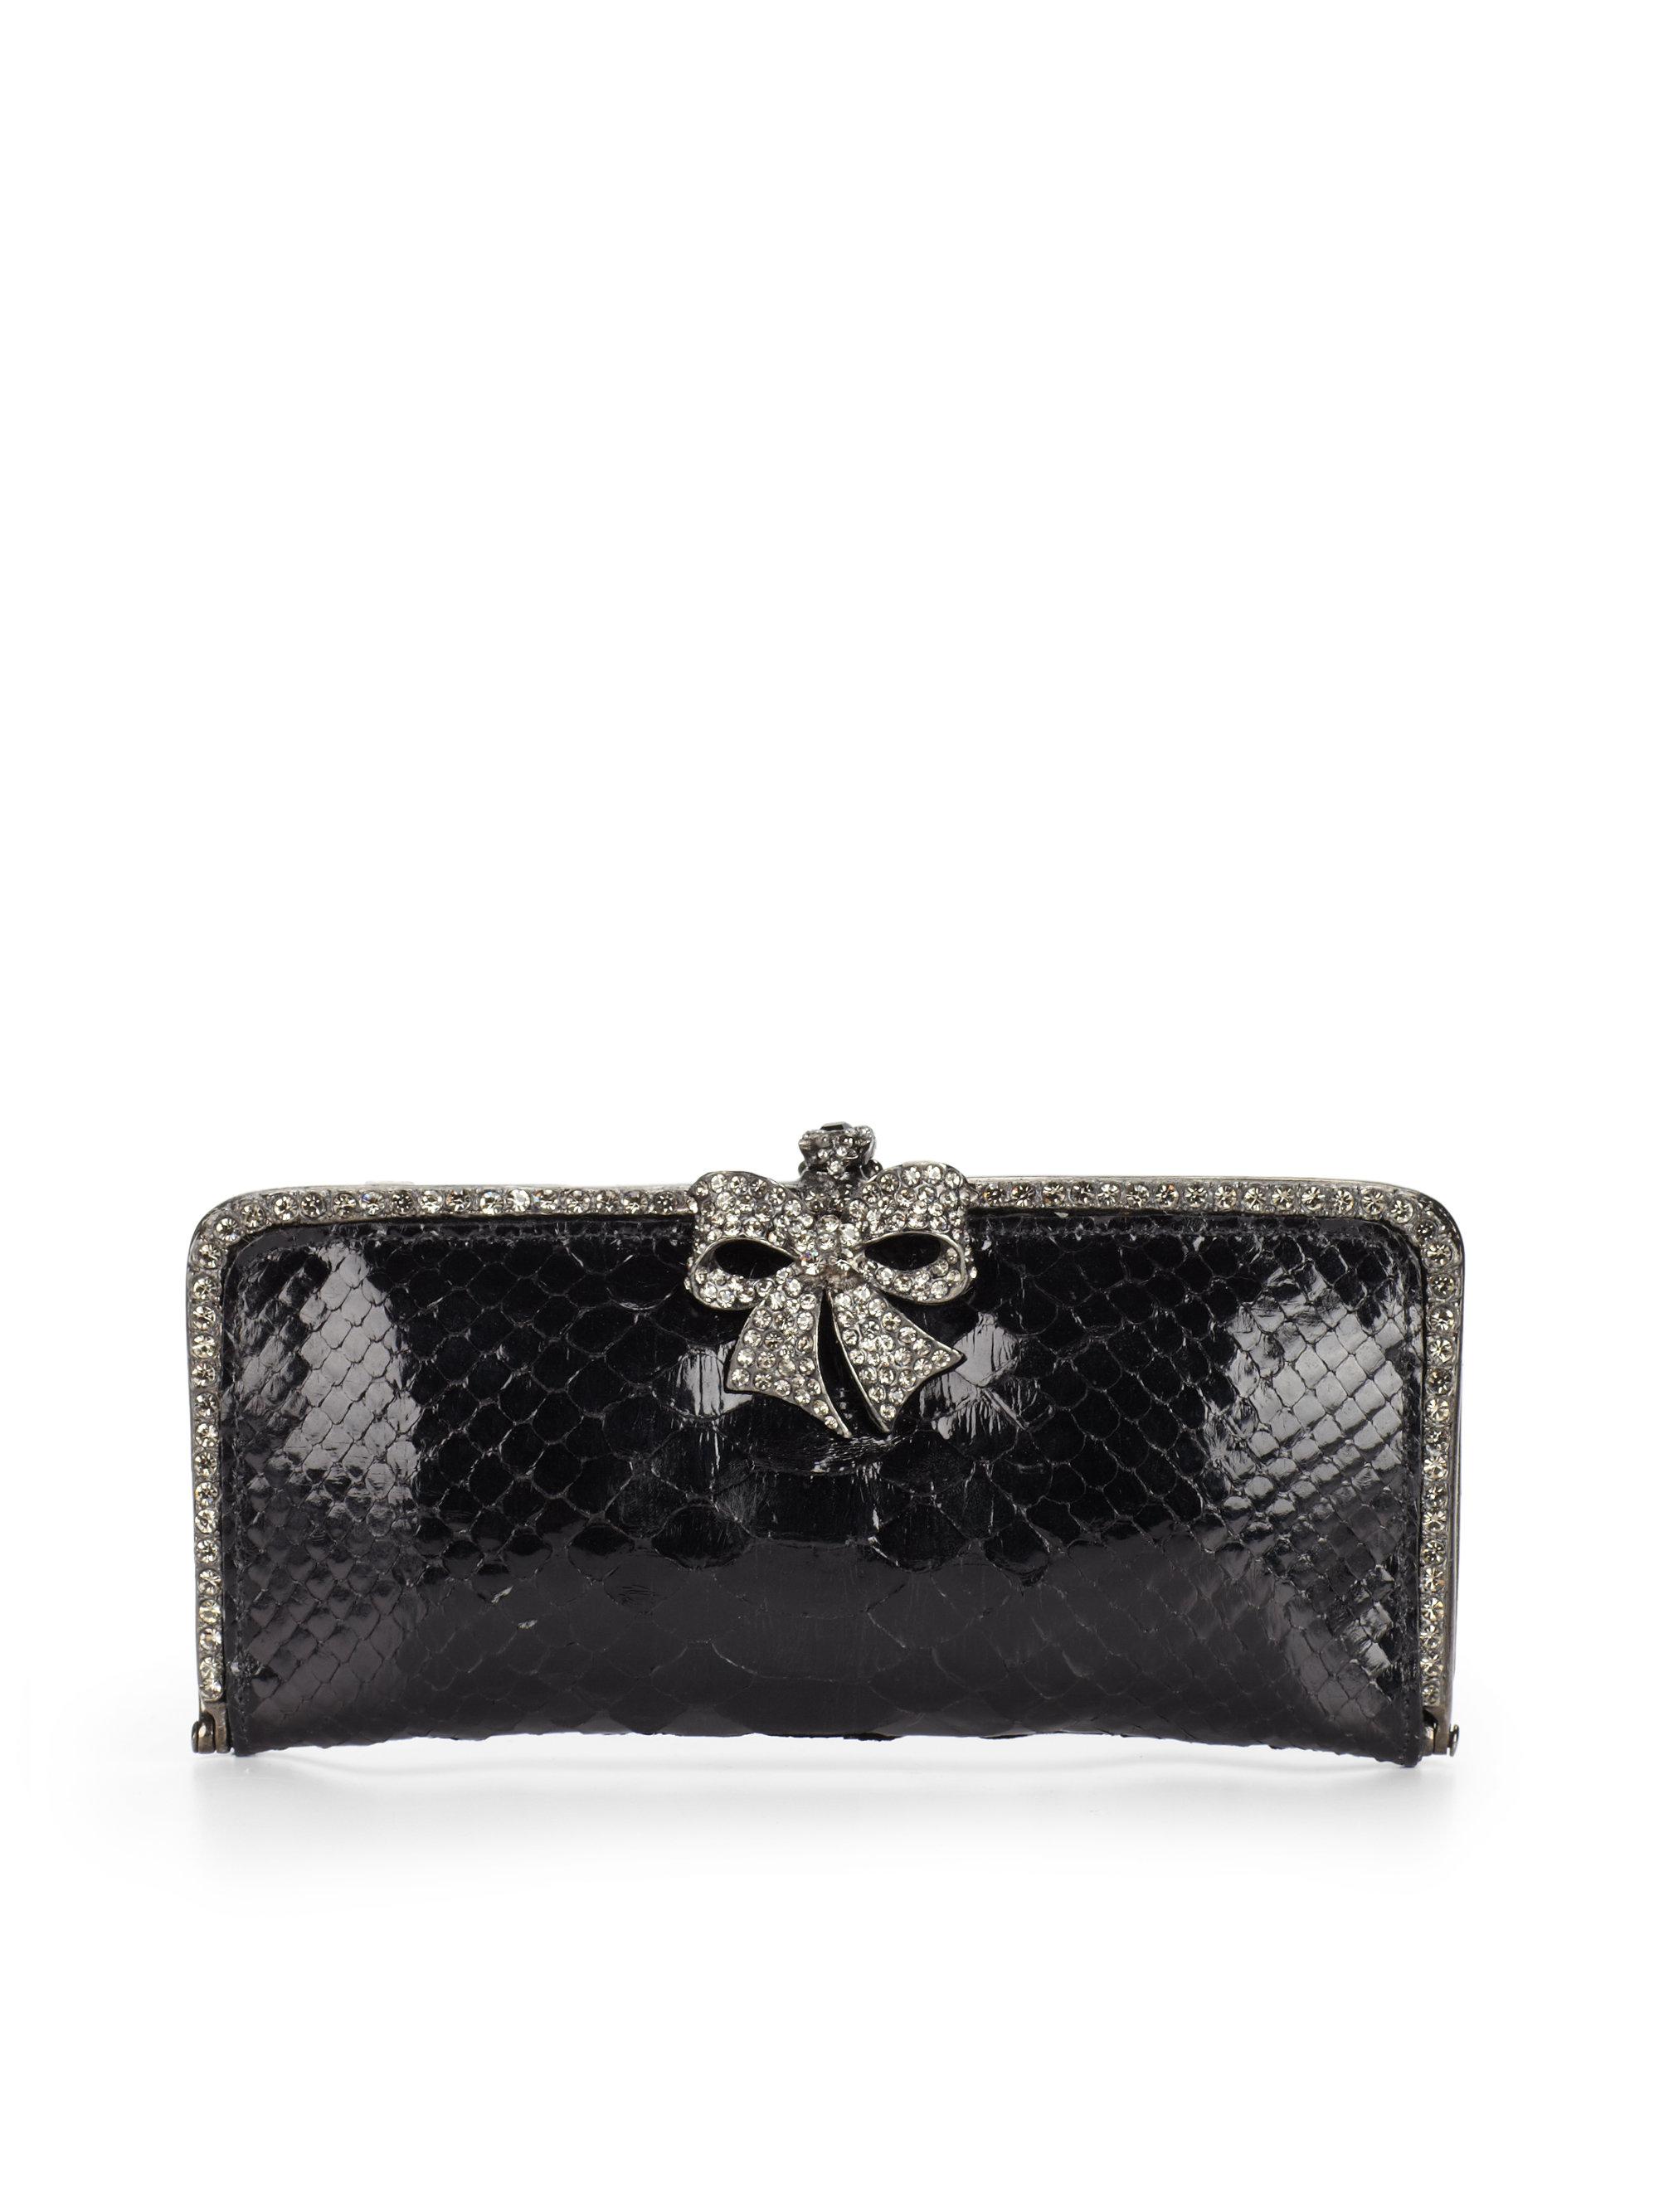 where to buy chloe handbags - chloe python crystal bow clutch, chloe replica shoes